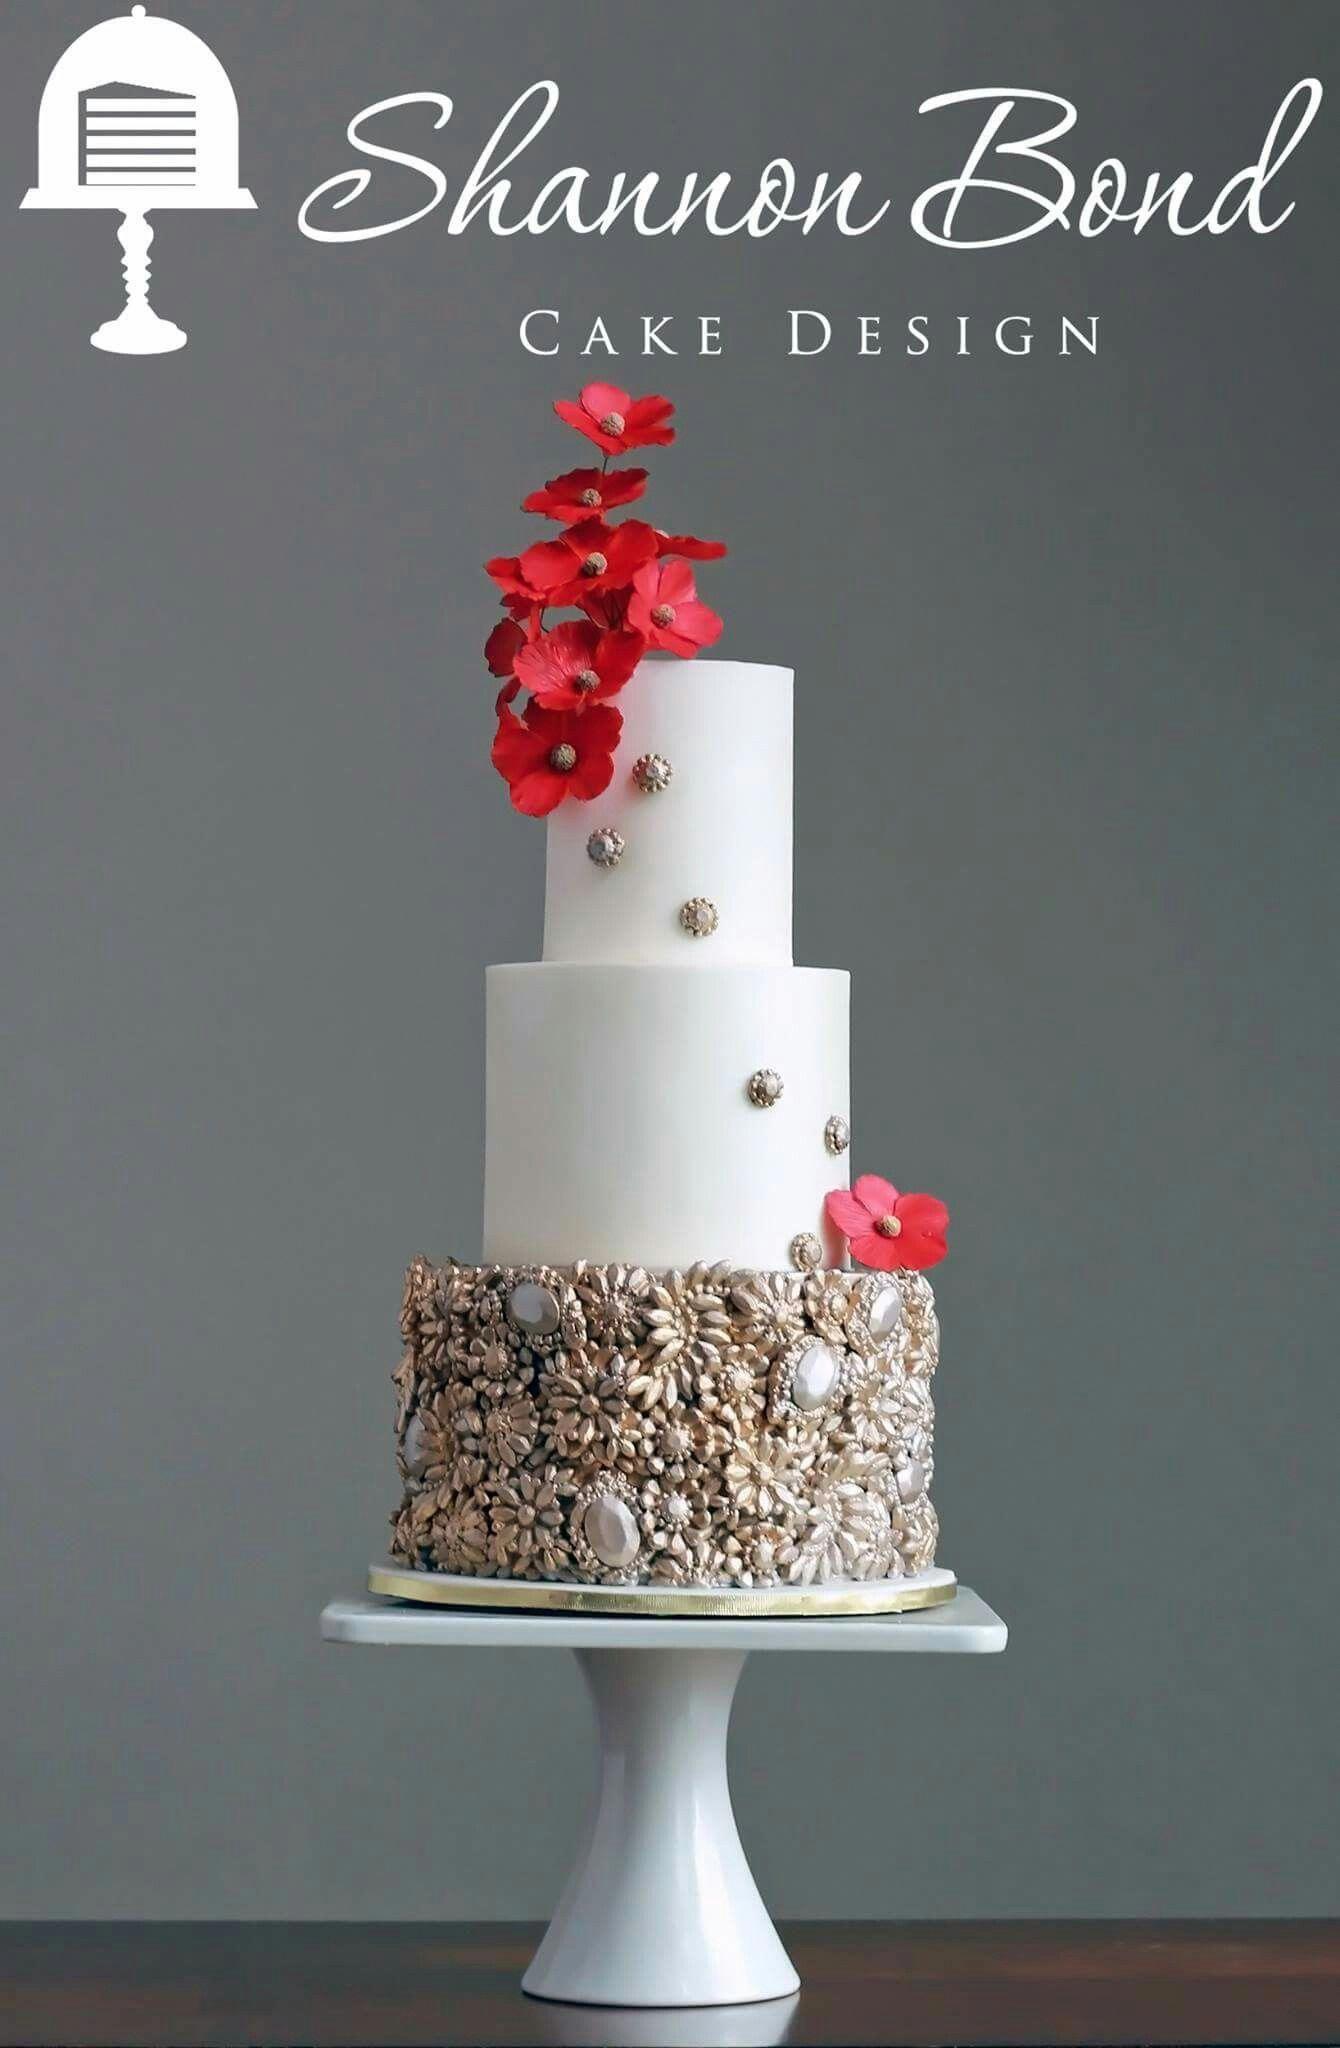 Chocolate and ricotta cake hq recipes recipe cake